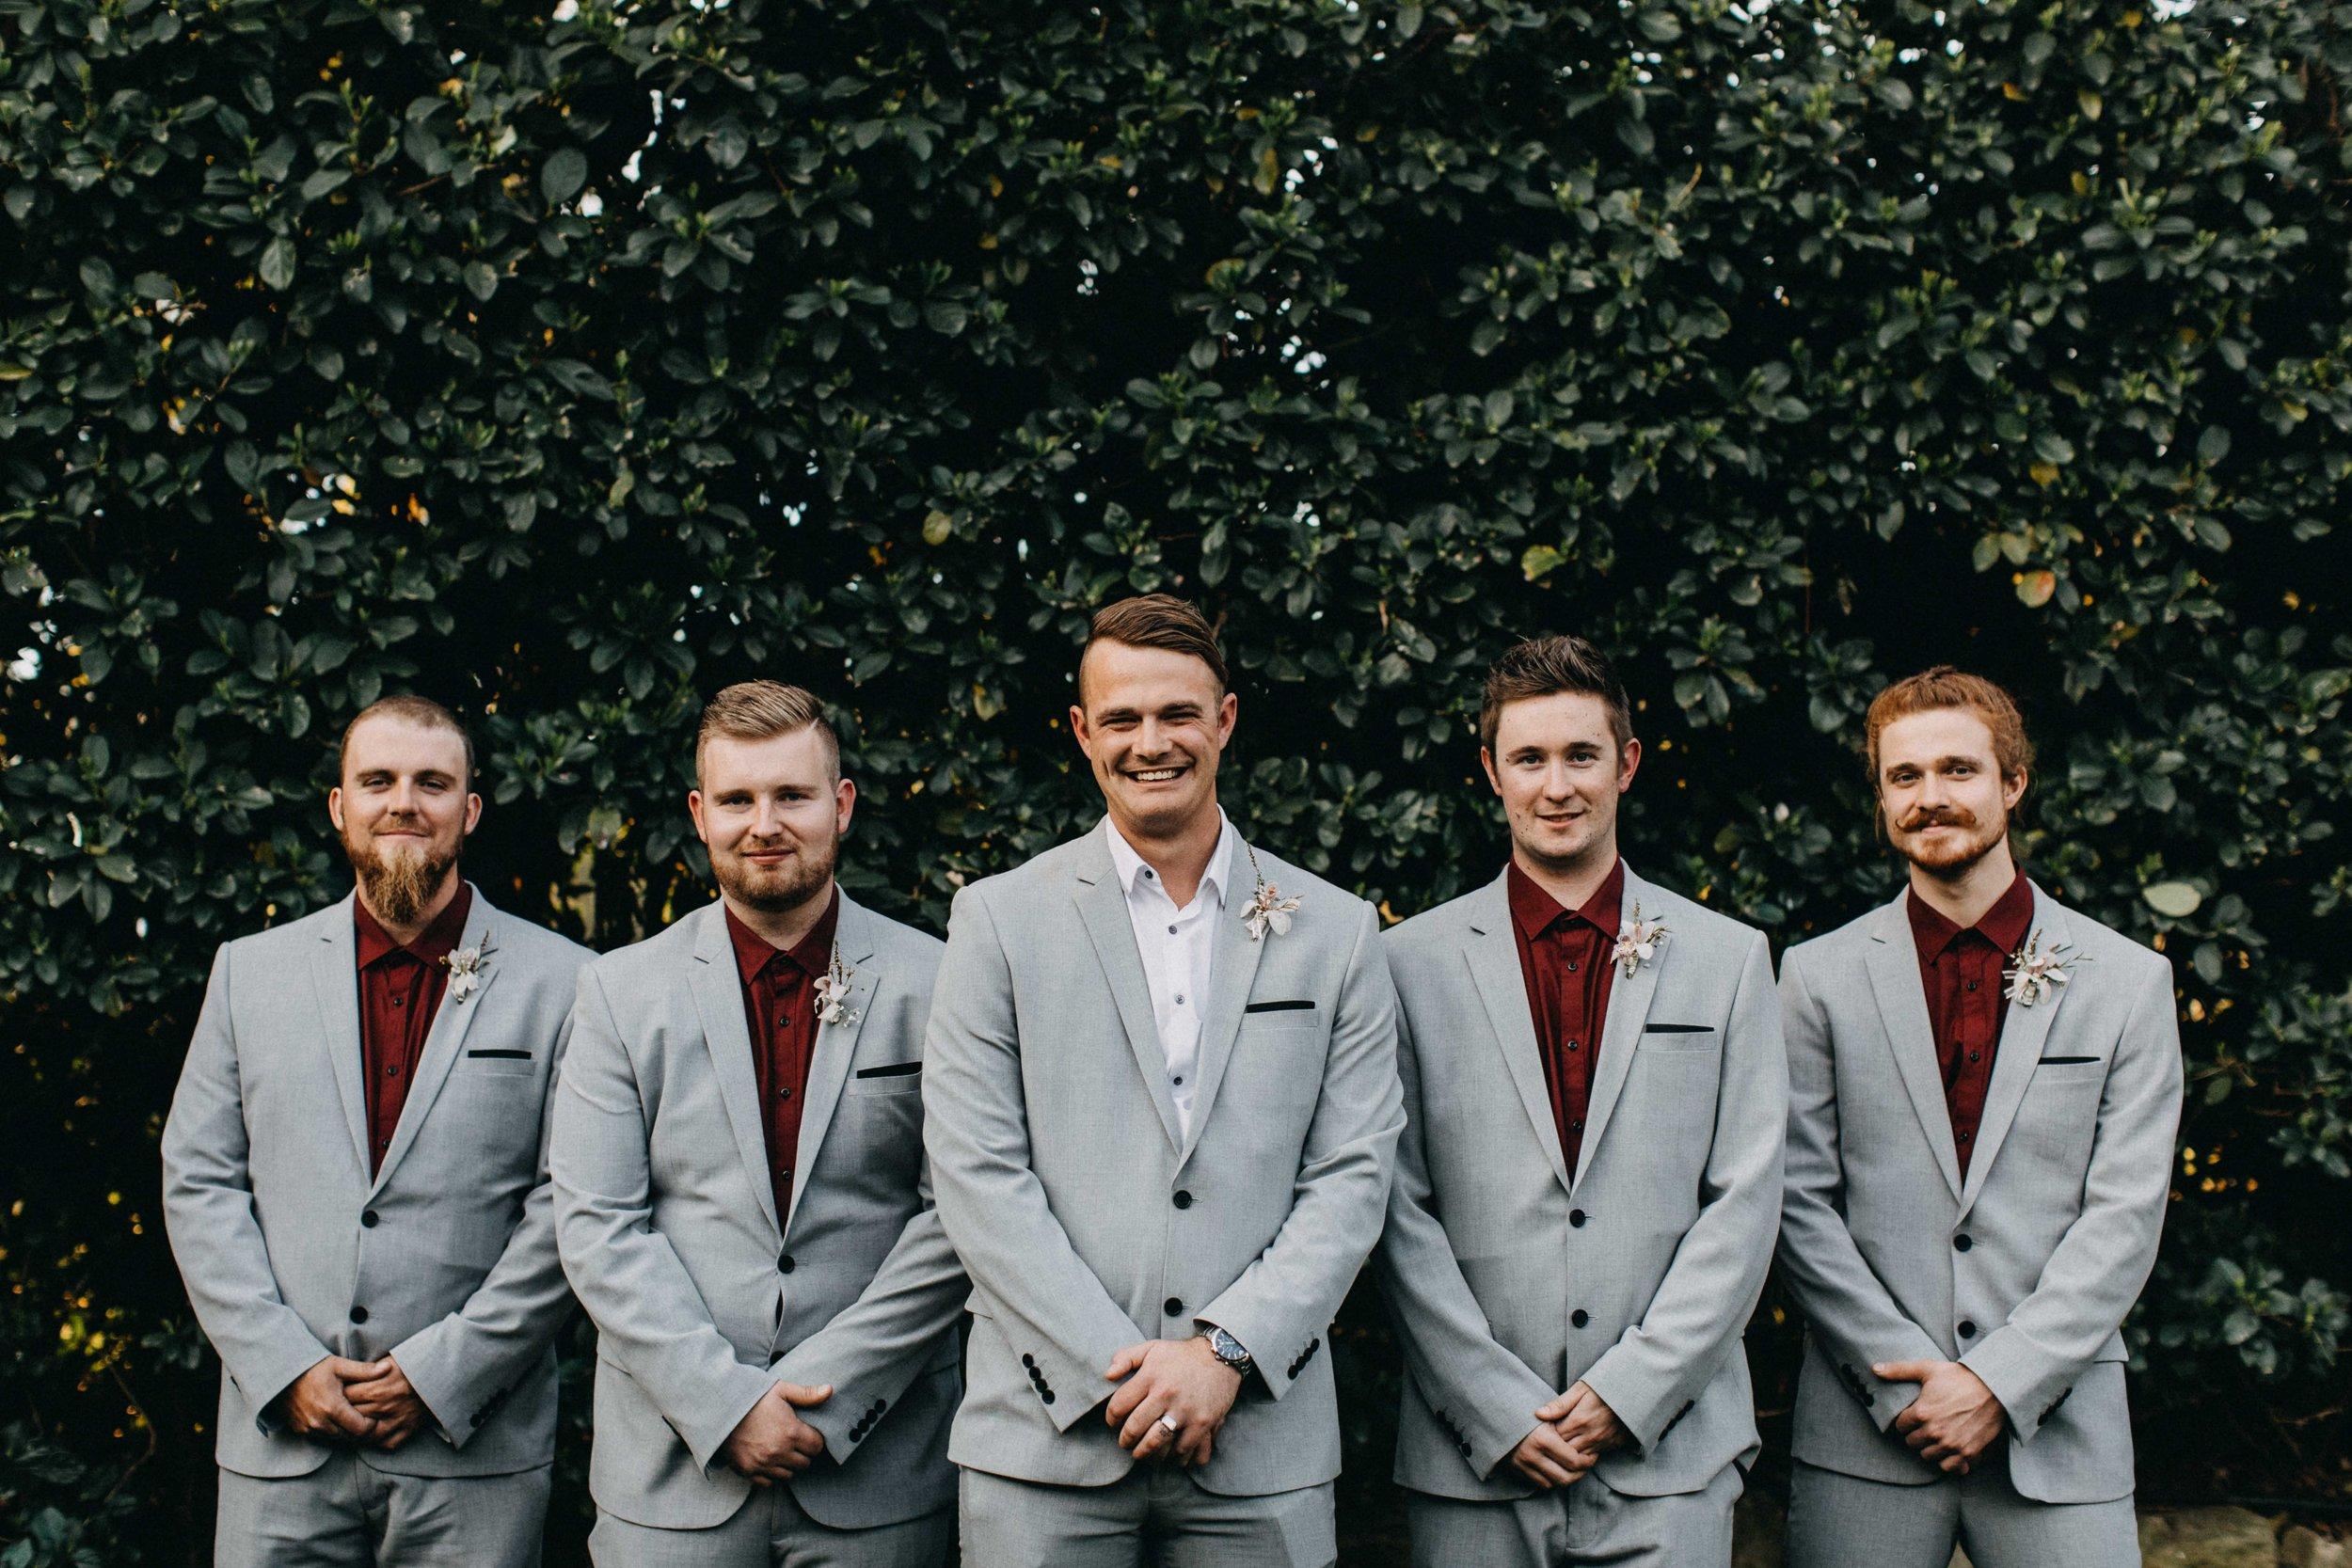 burnham-grove-camden-wedding-emilyobrienphotography-macarthur-111.jpg